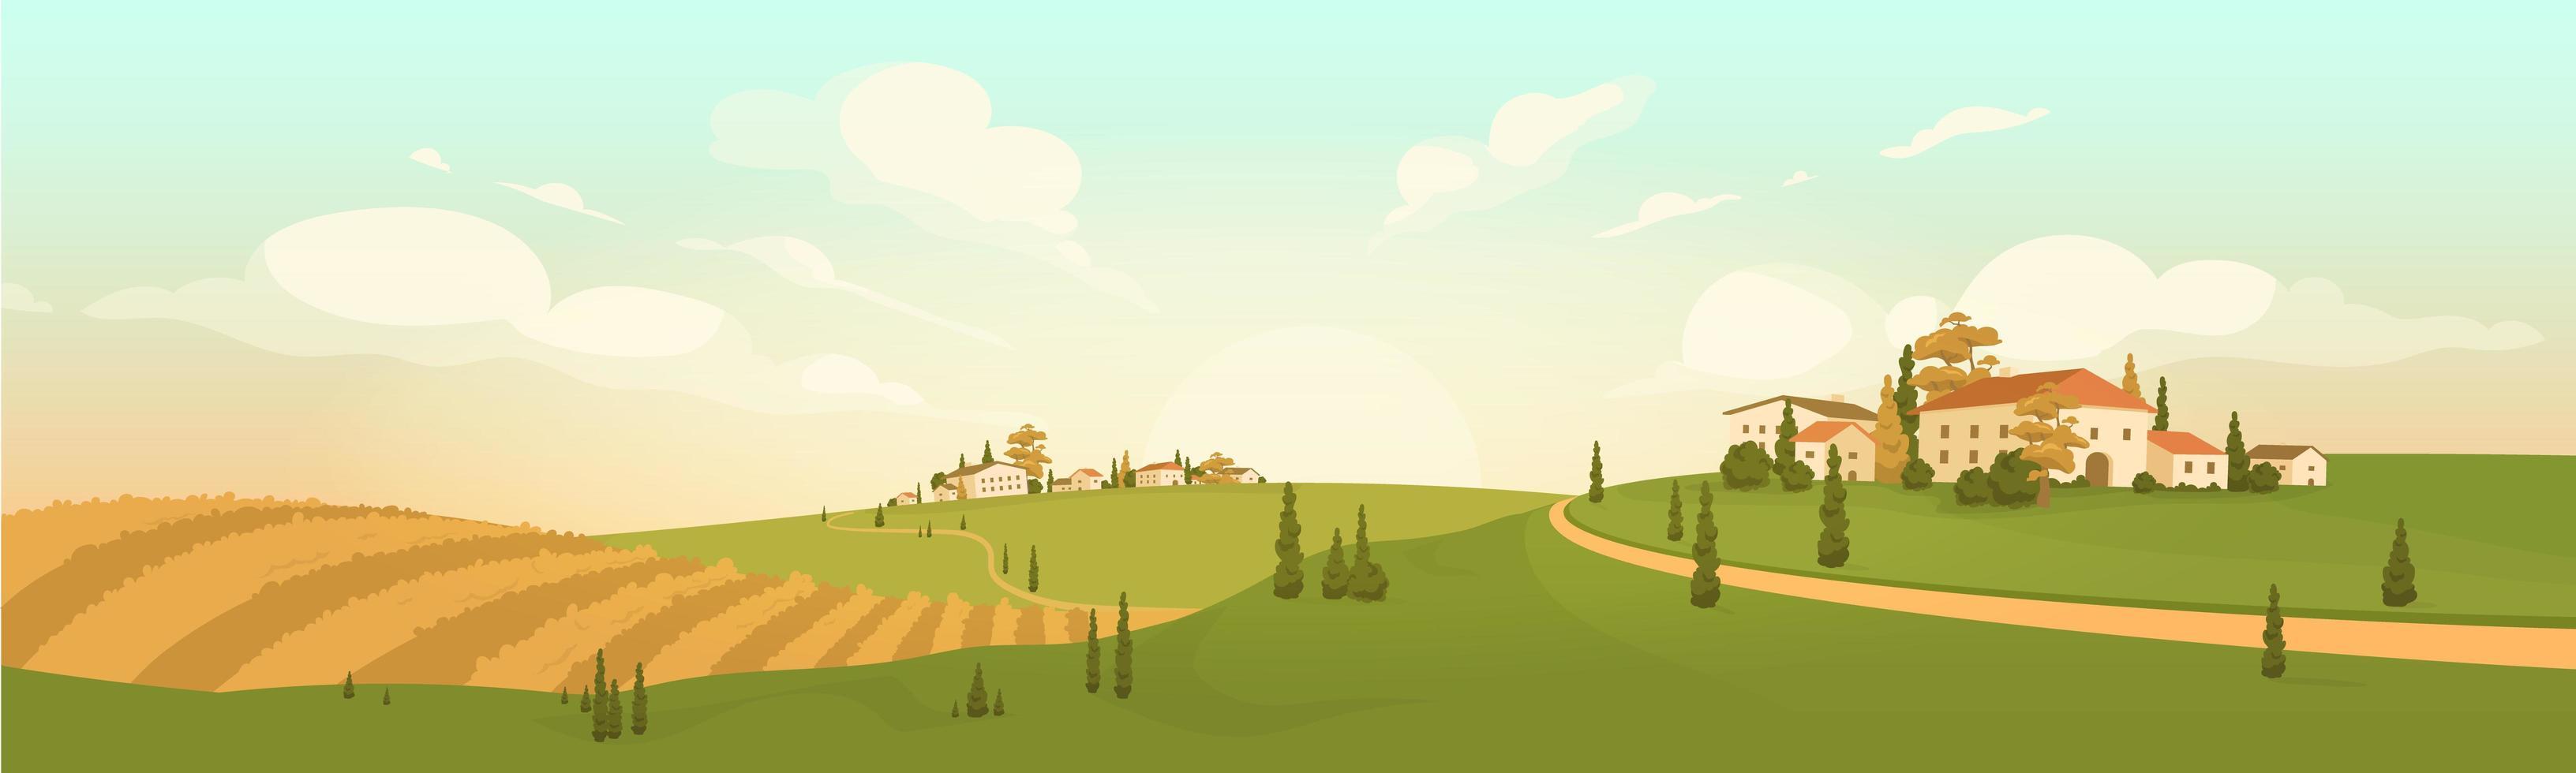 höst i kulle byn vektor